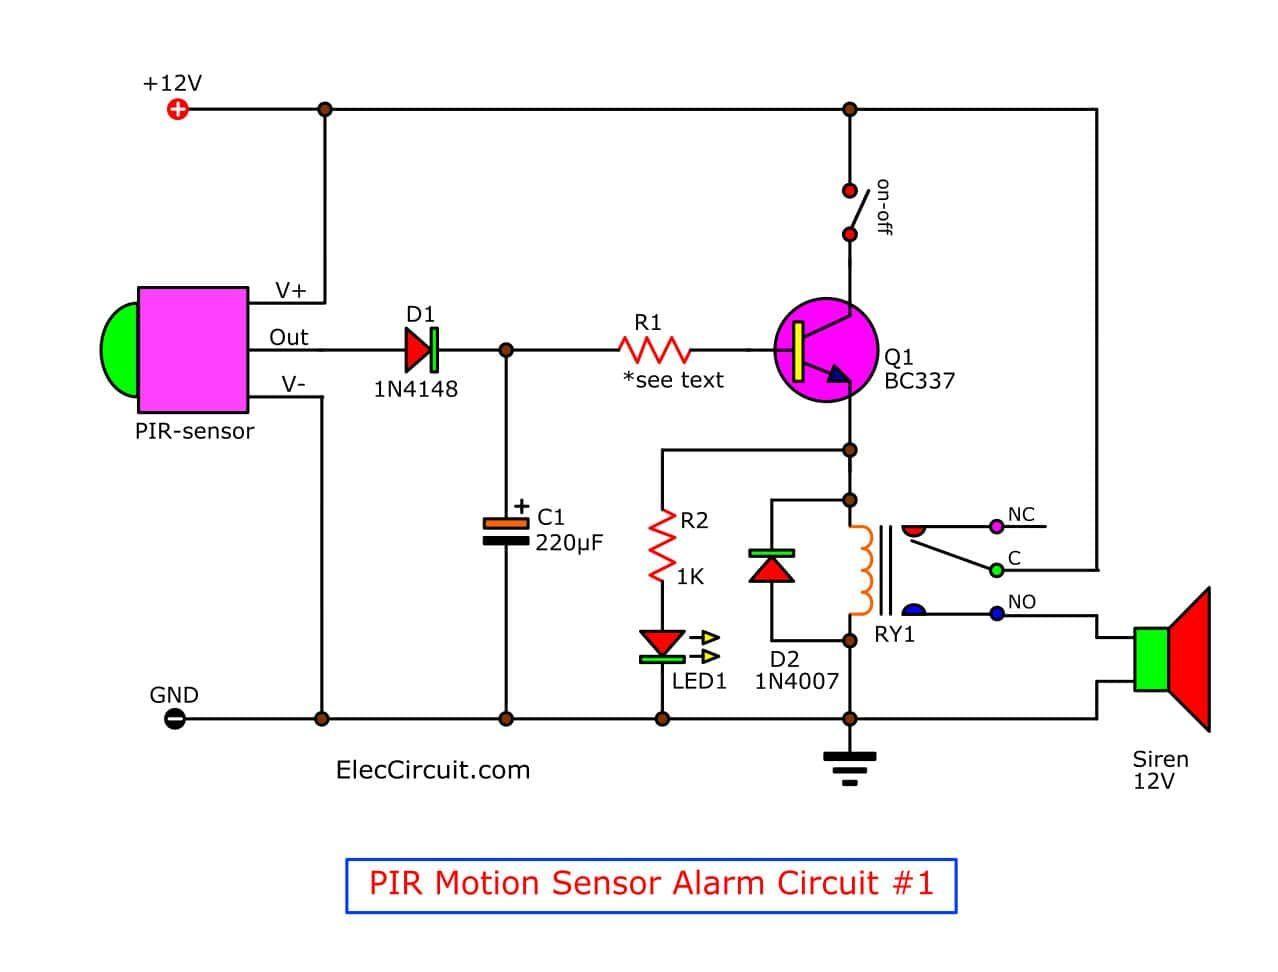 Bewegungsmelder Alarmschaltung Mit Pir Sensor Einfach Und Gunstig Elektroniken Bewegungsmelderala Motion Detector Electrical Circuit Diagram Circuit Projects